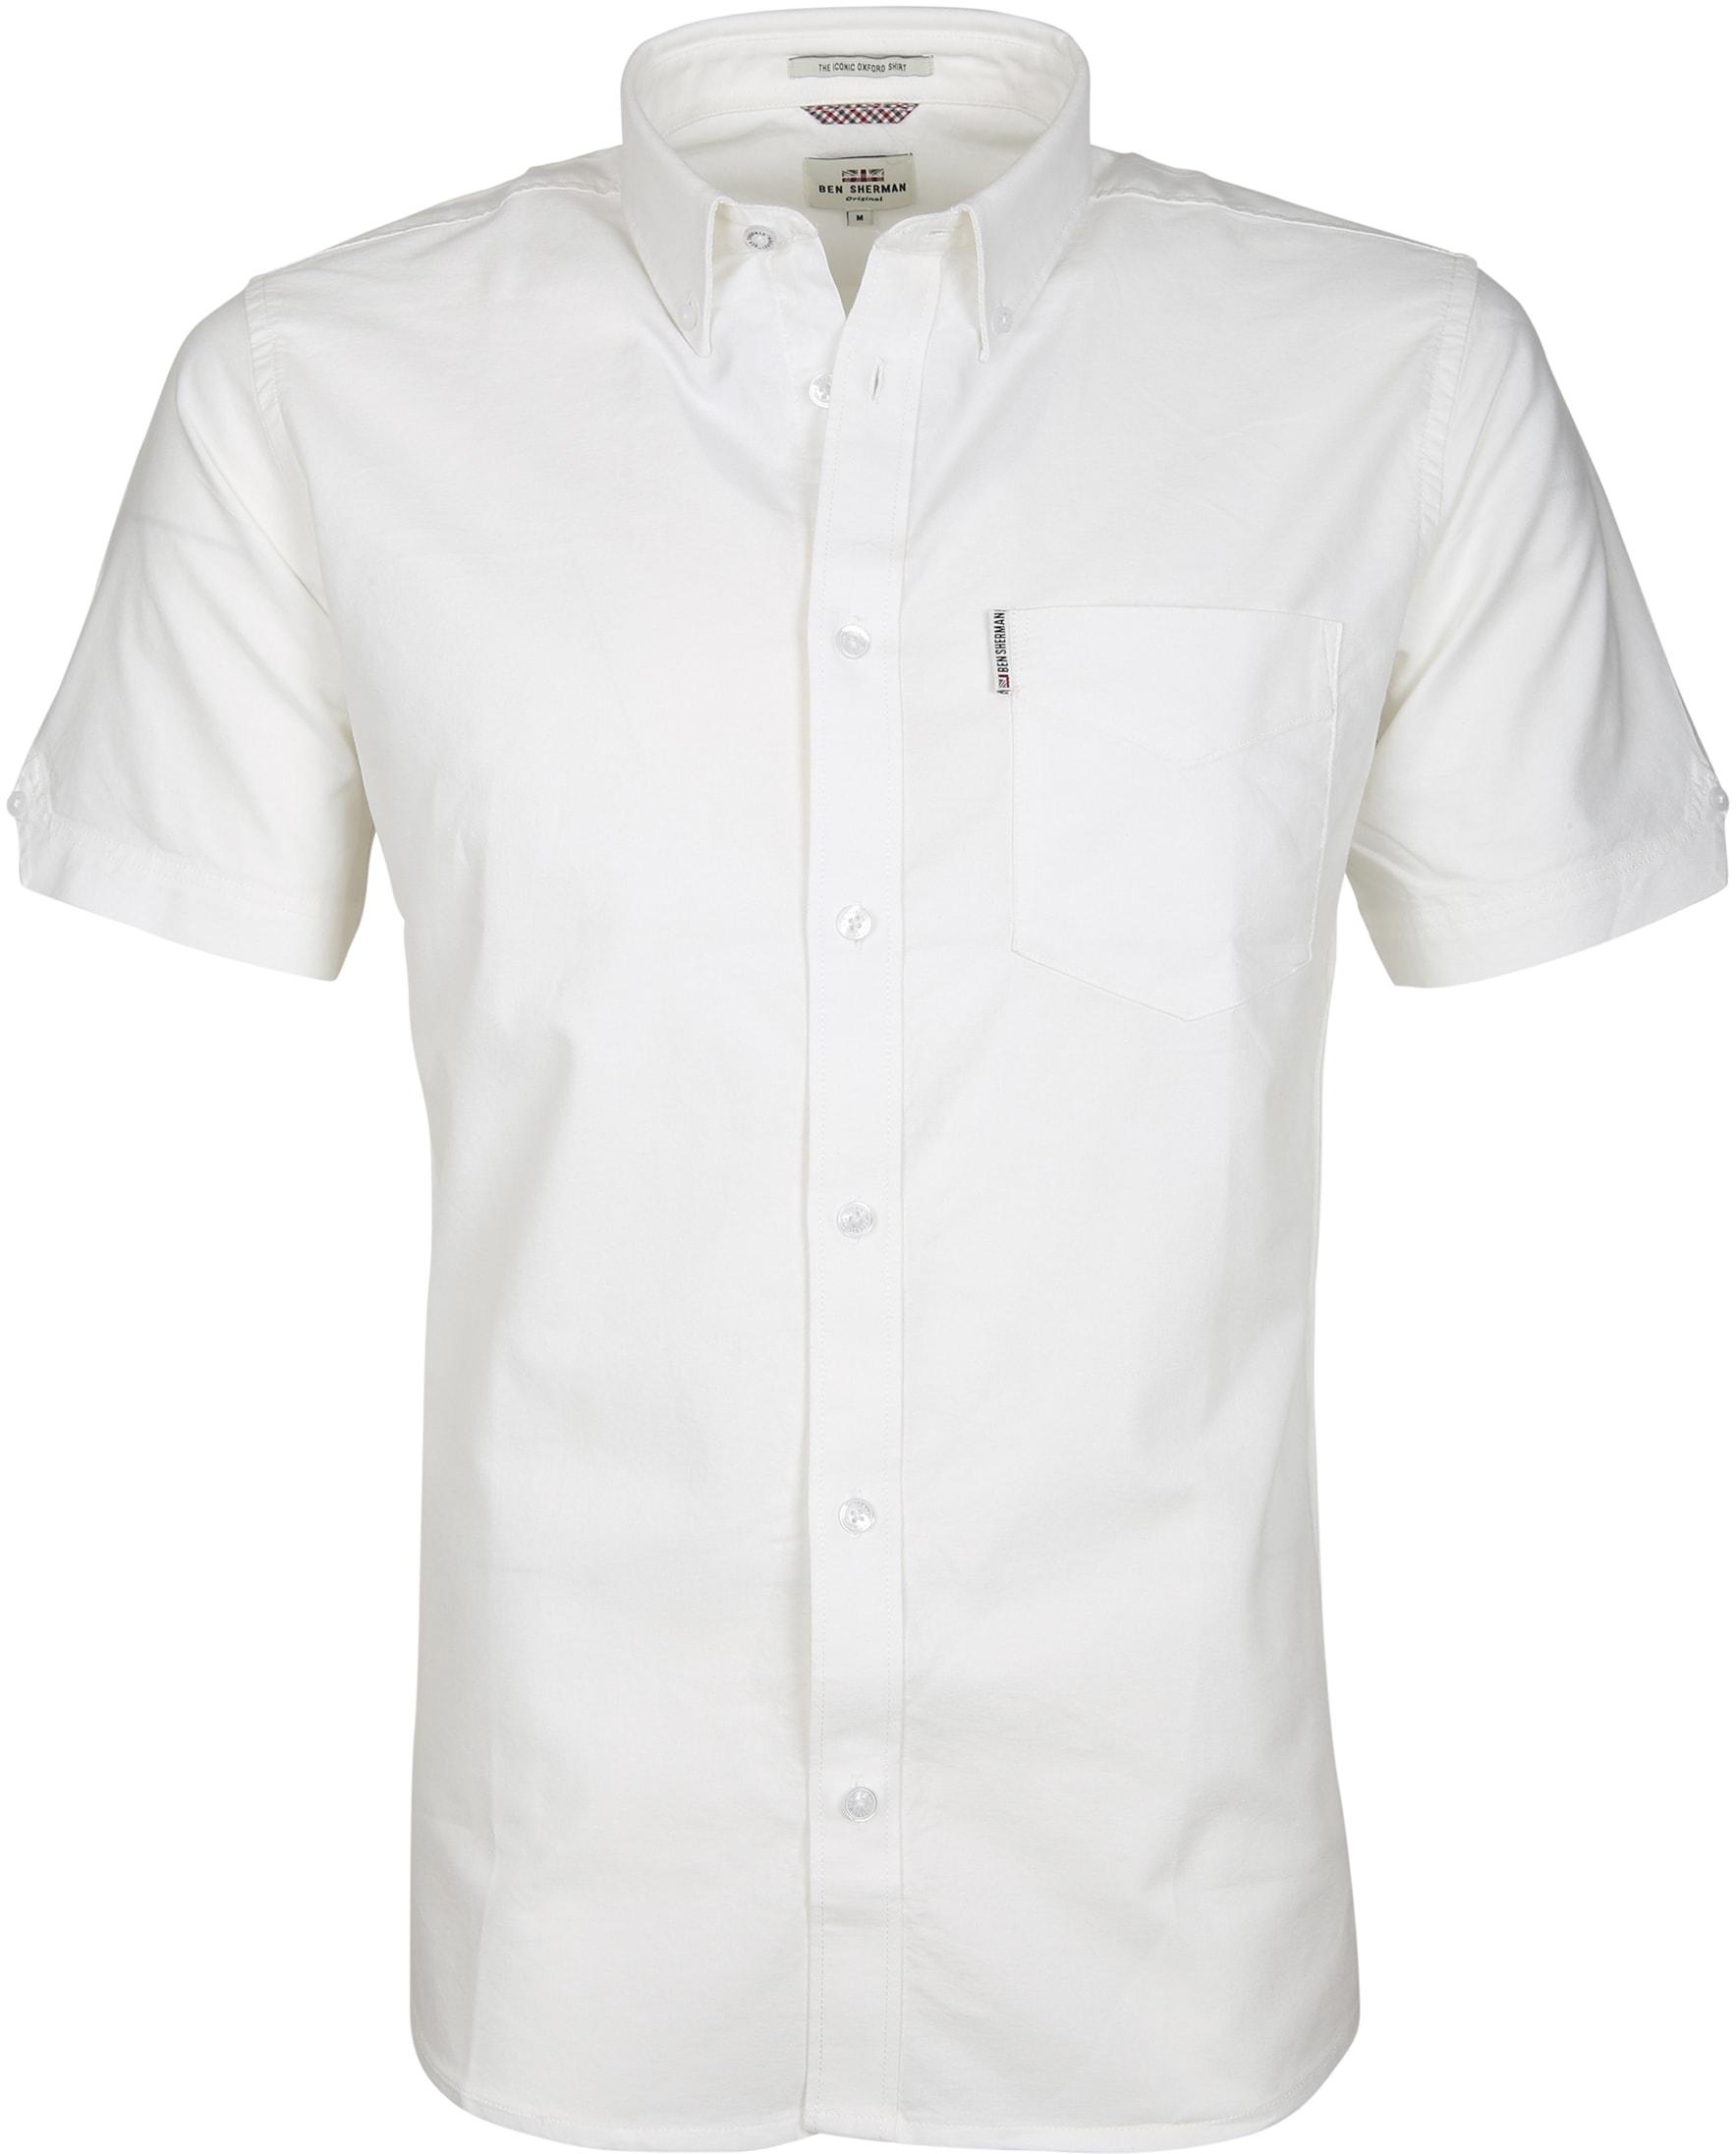 Ben Sherman Overhemd SS Wit foto 0